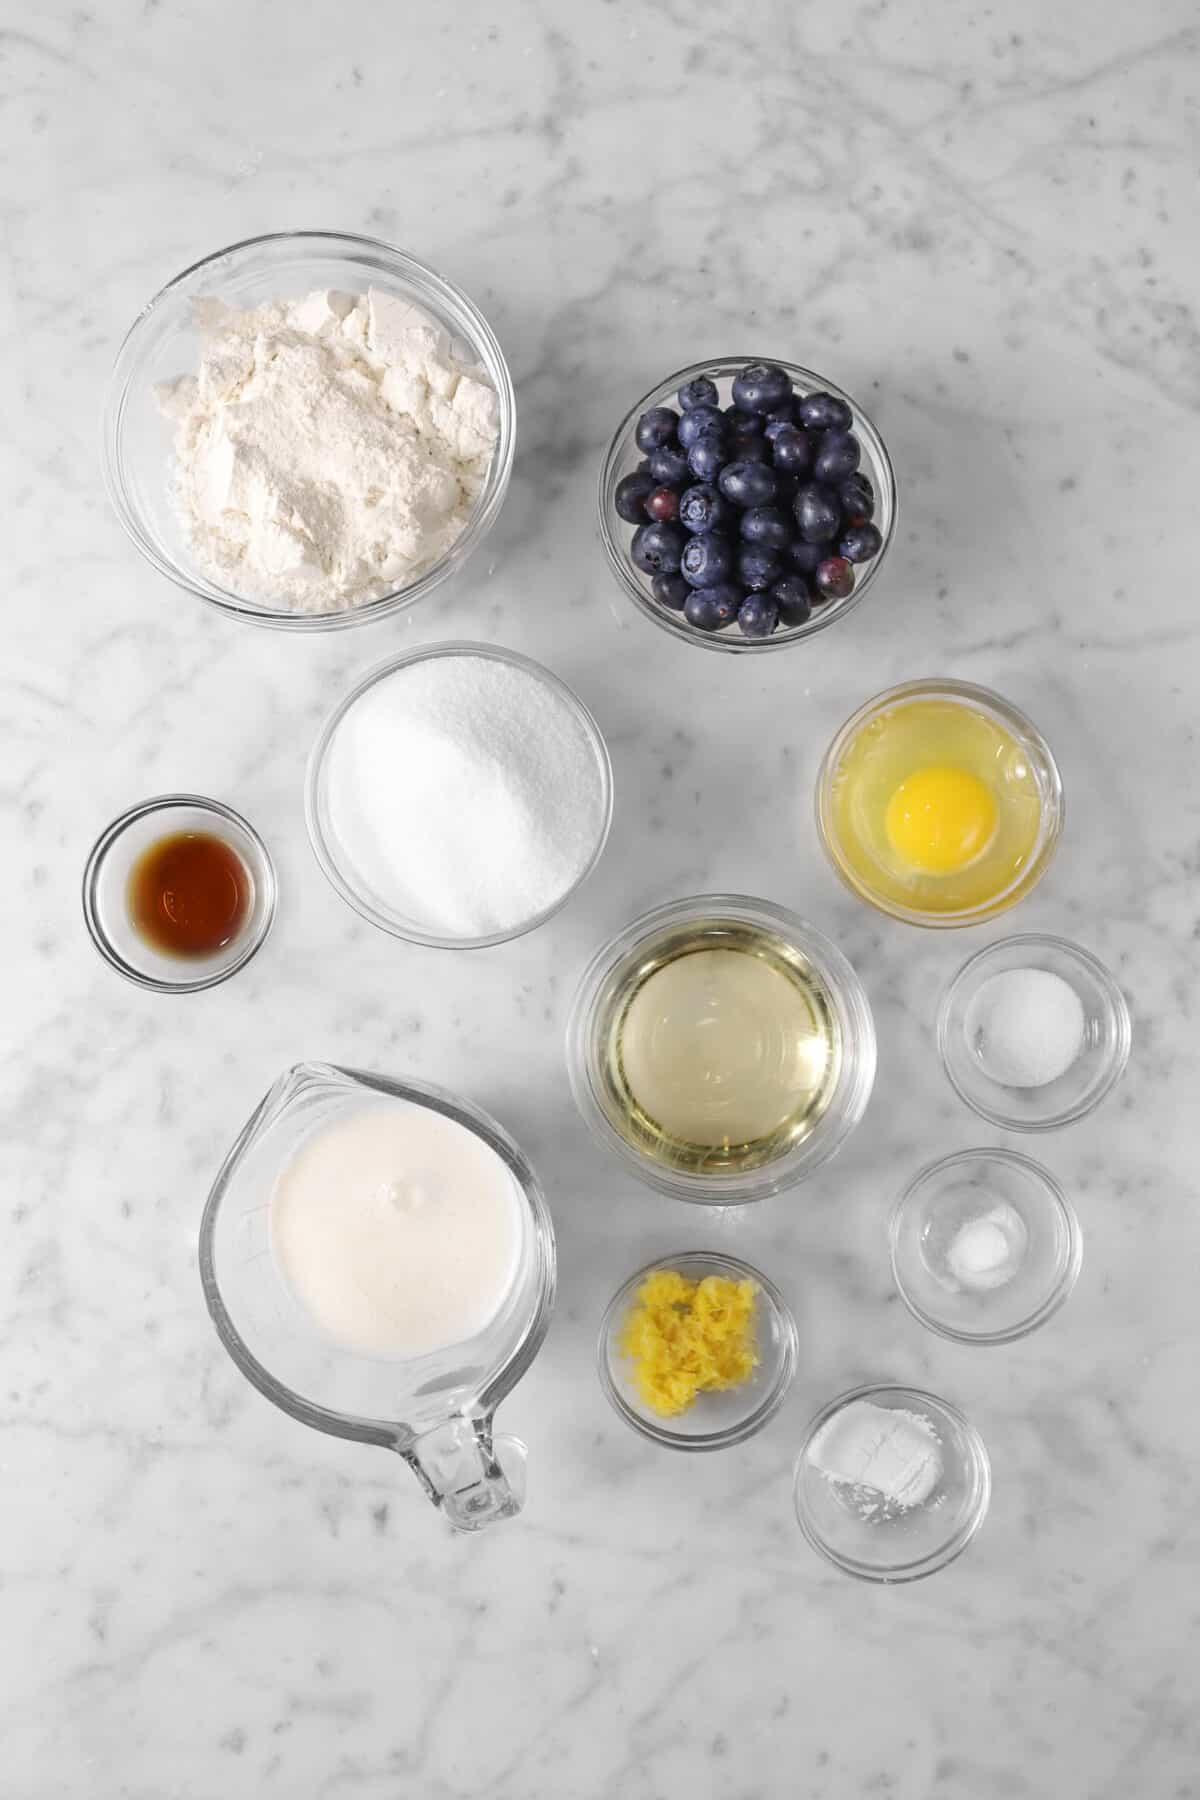 flour, blueberries, sugar, vanilla, egg, oil, buttermilk, lemon zest, baking powder, baking soda, and salt on a marble counter